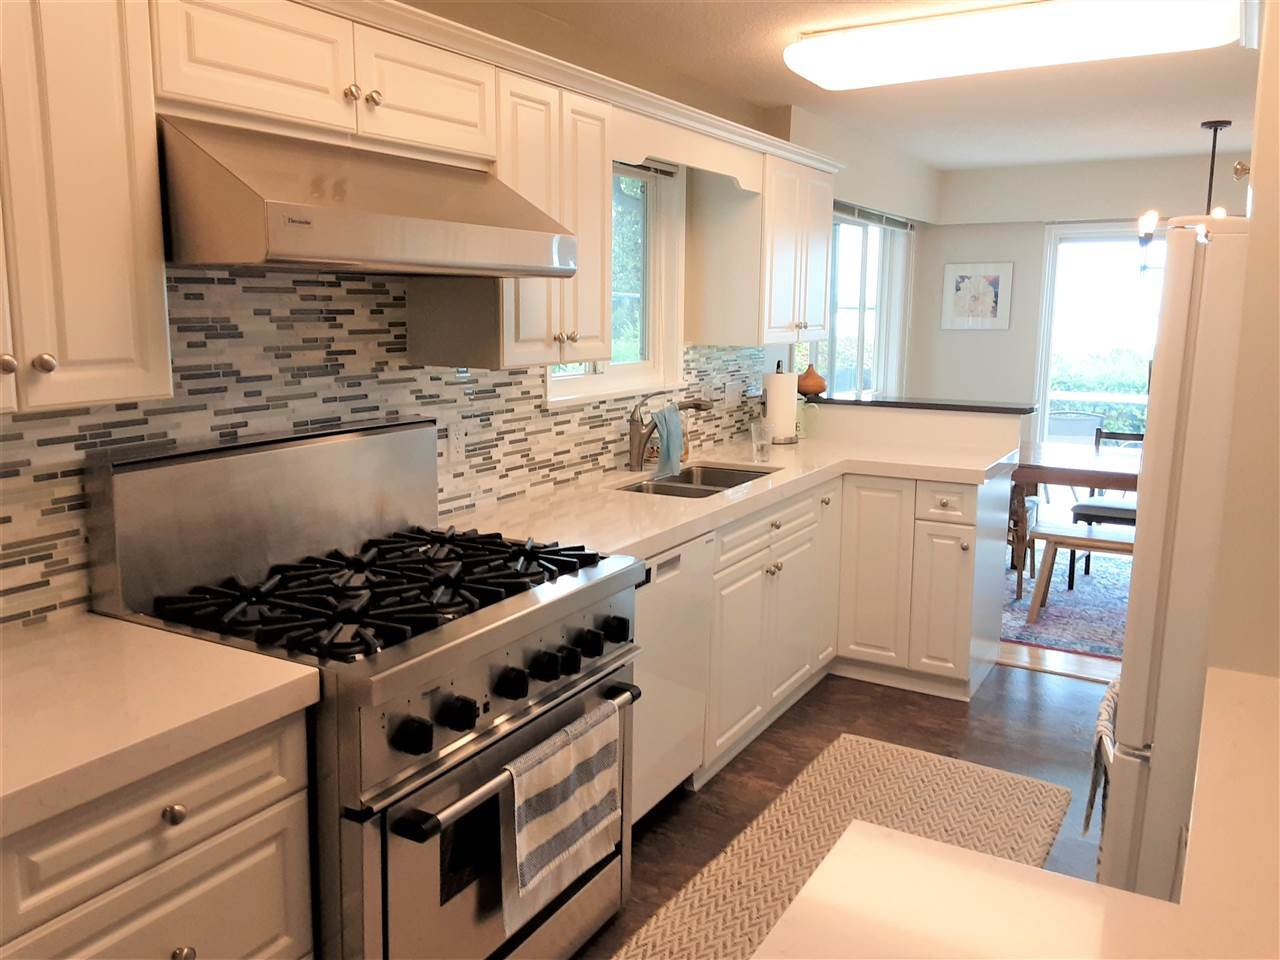 Photo 6: Photos: 15291 COLUMBIA Avenue: White Rock House for sale (South Surrey White Rock)  : MLS®# R2492863